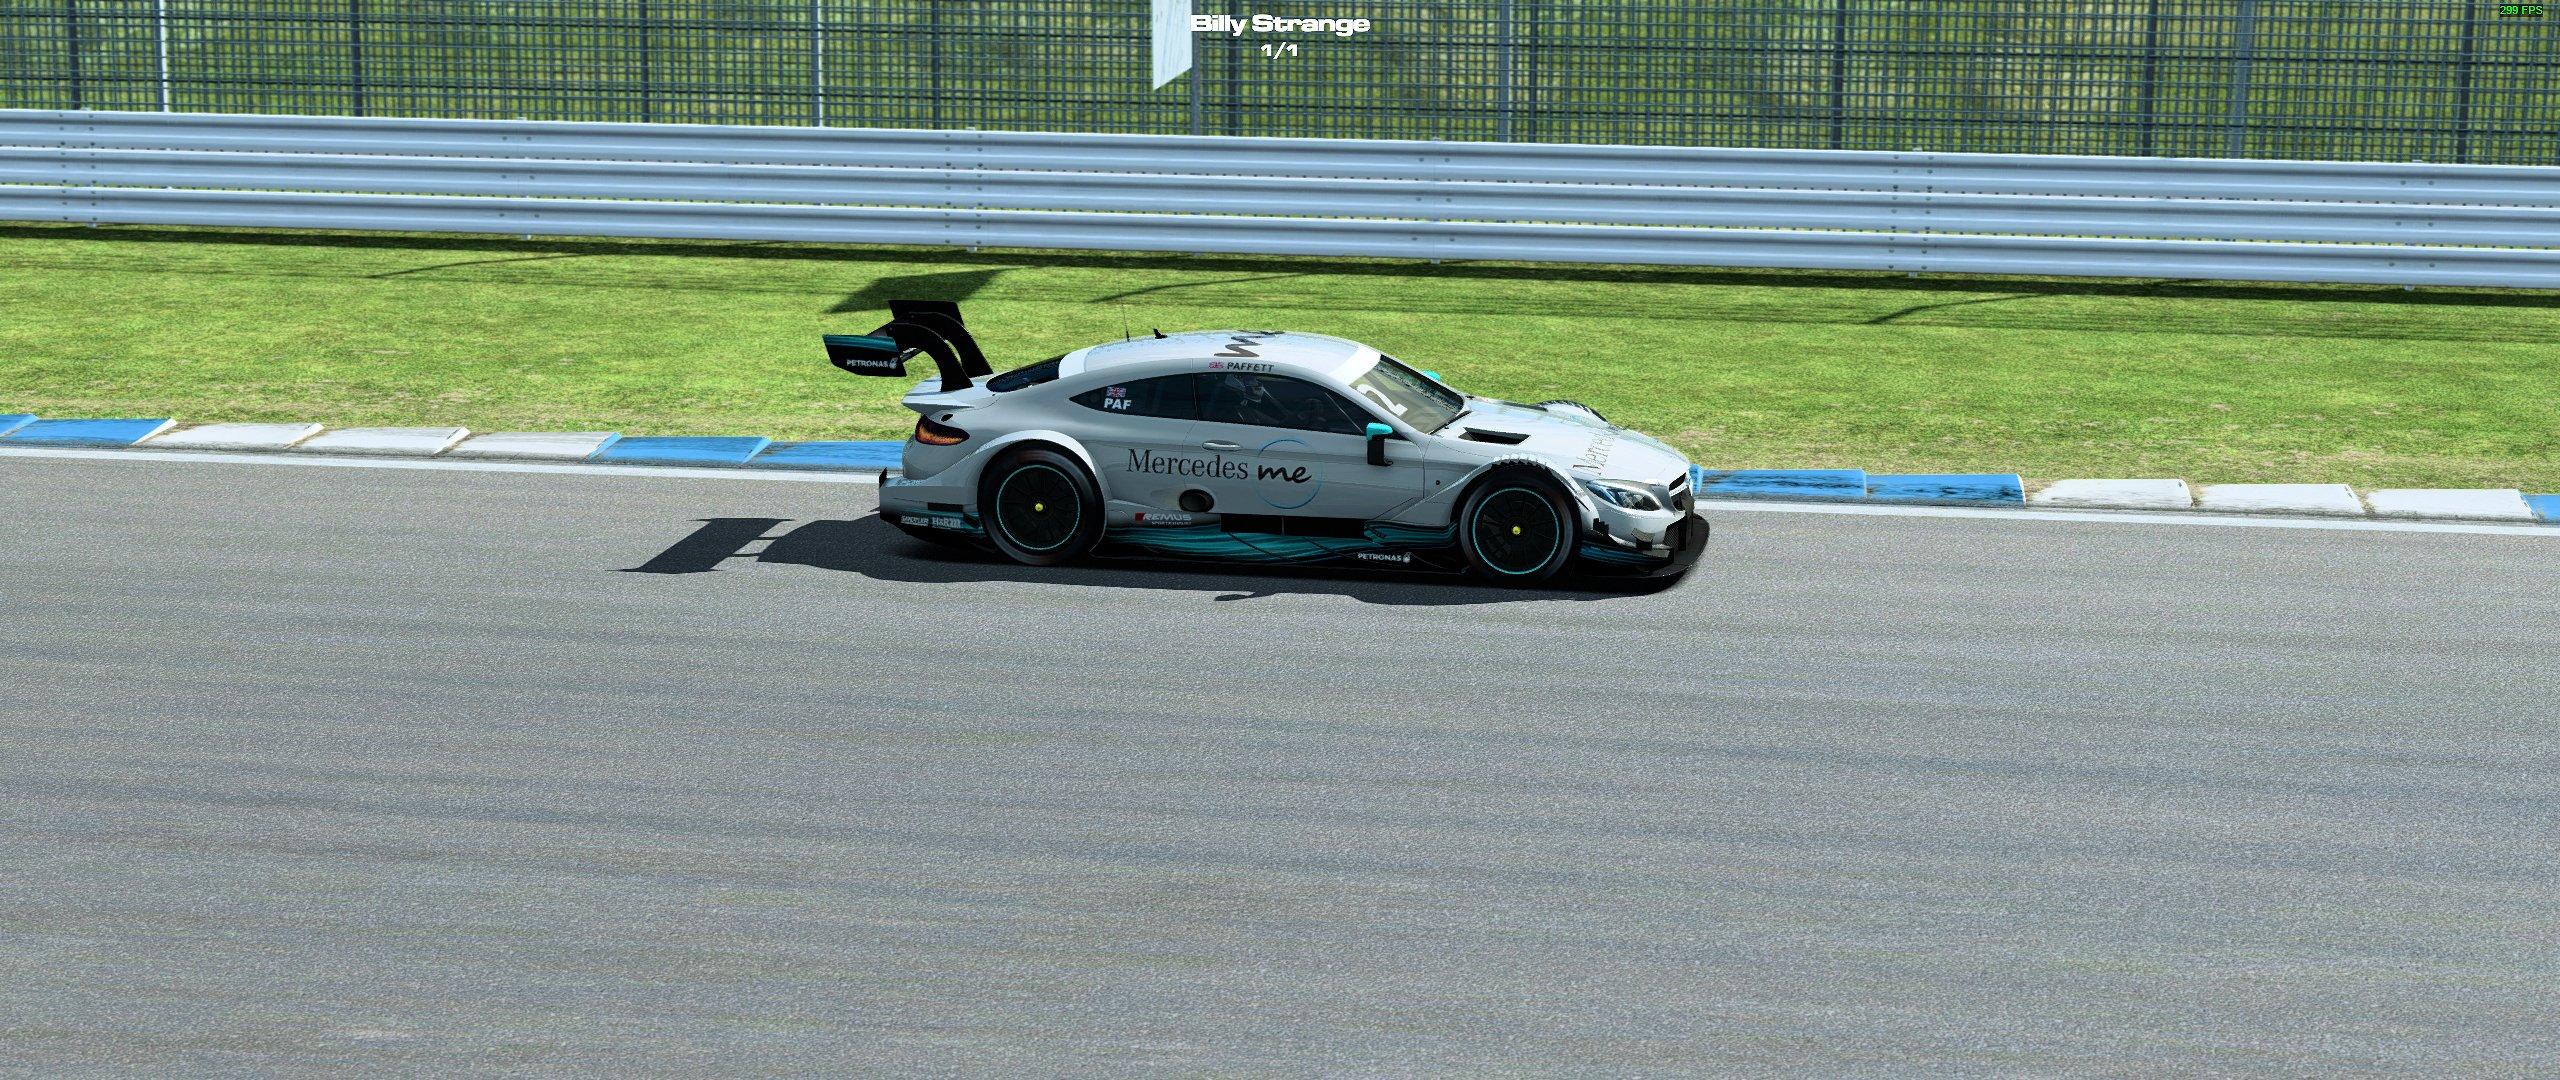 raceroom mercedes dtm competition